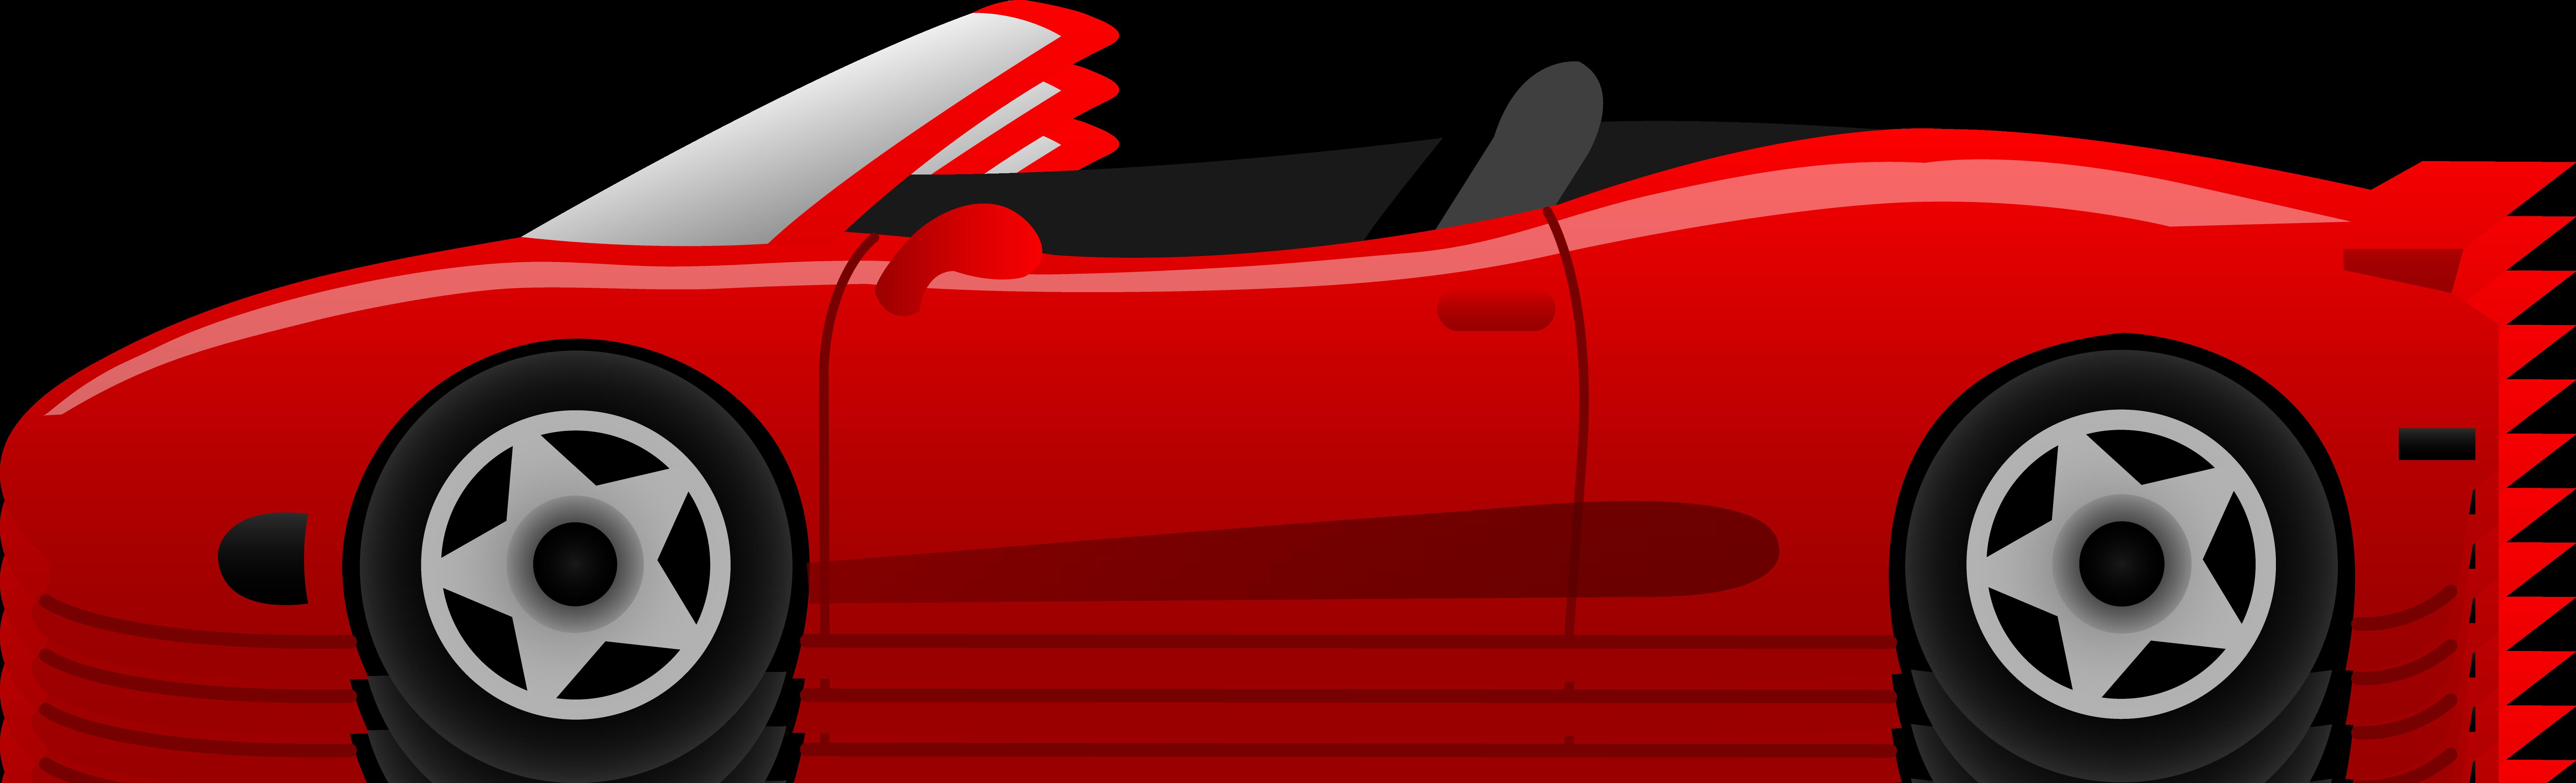 Race Car Clipart Clipart Free Clipart Images